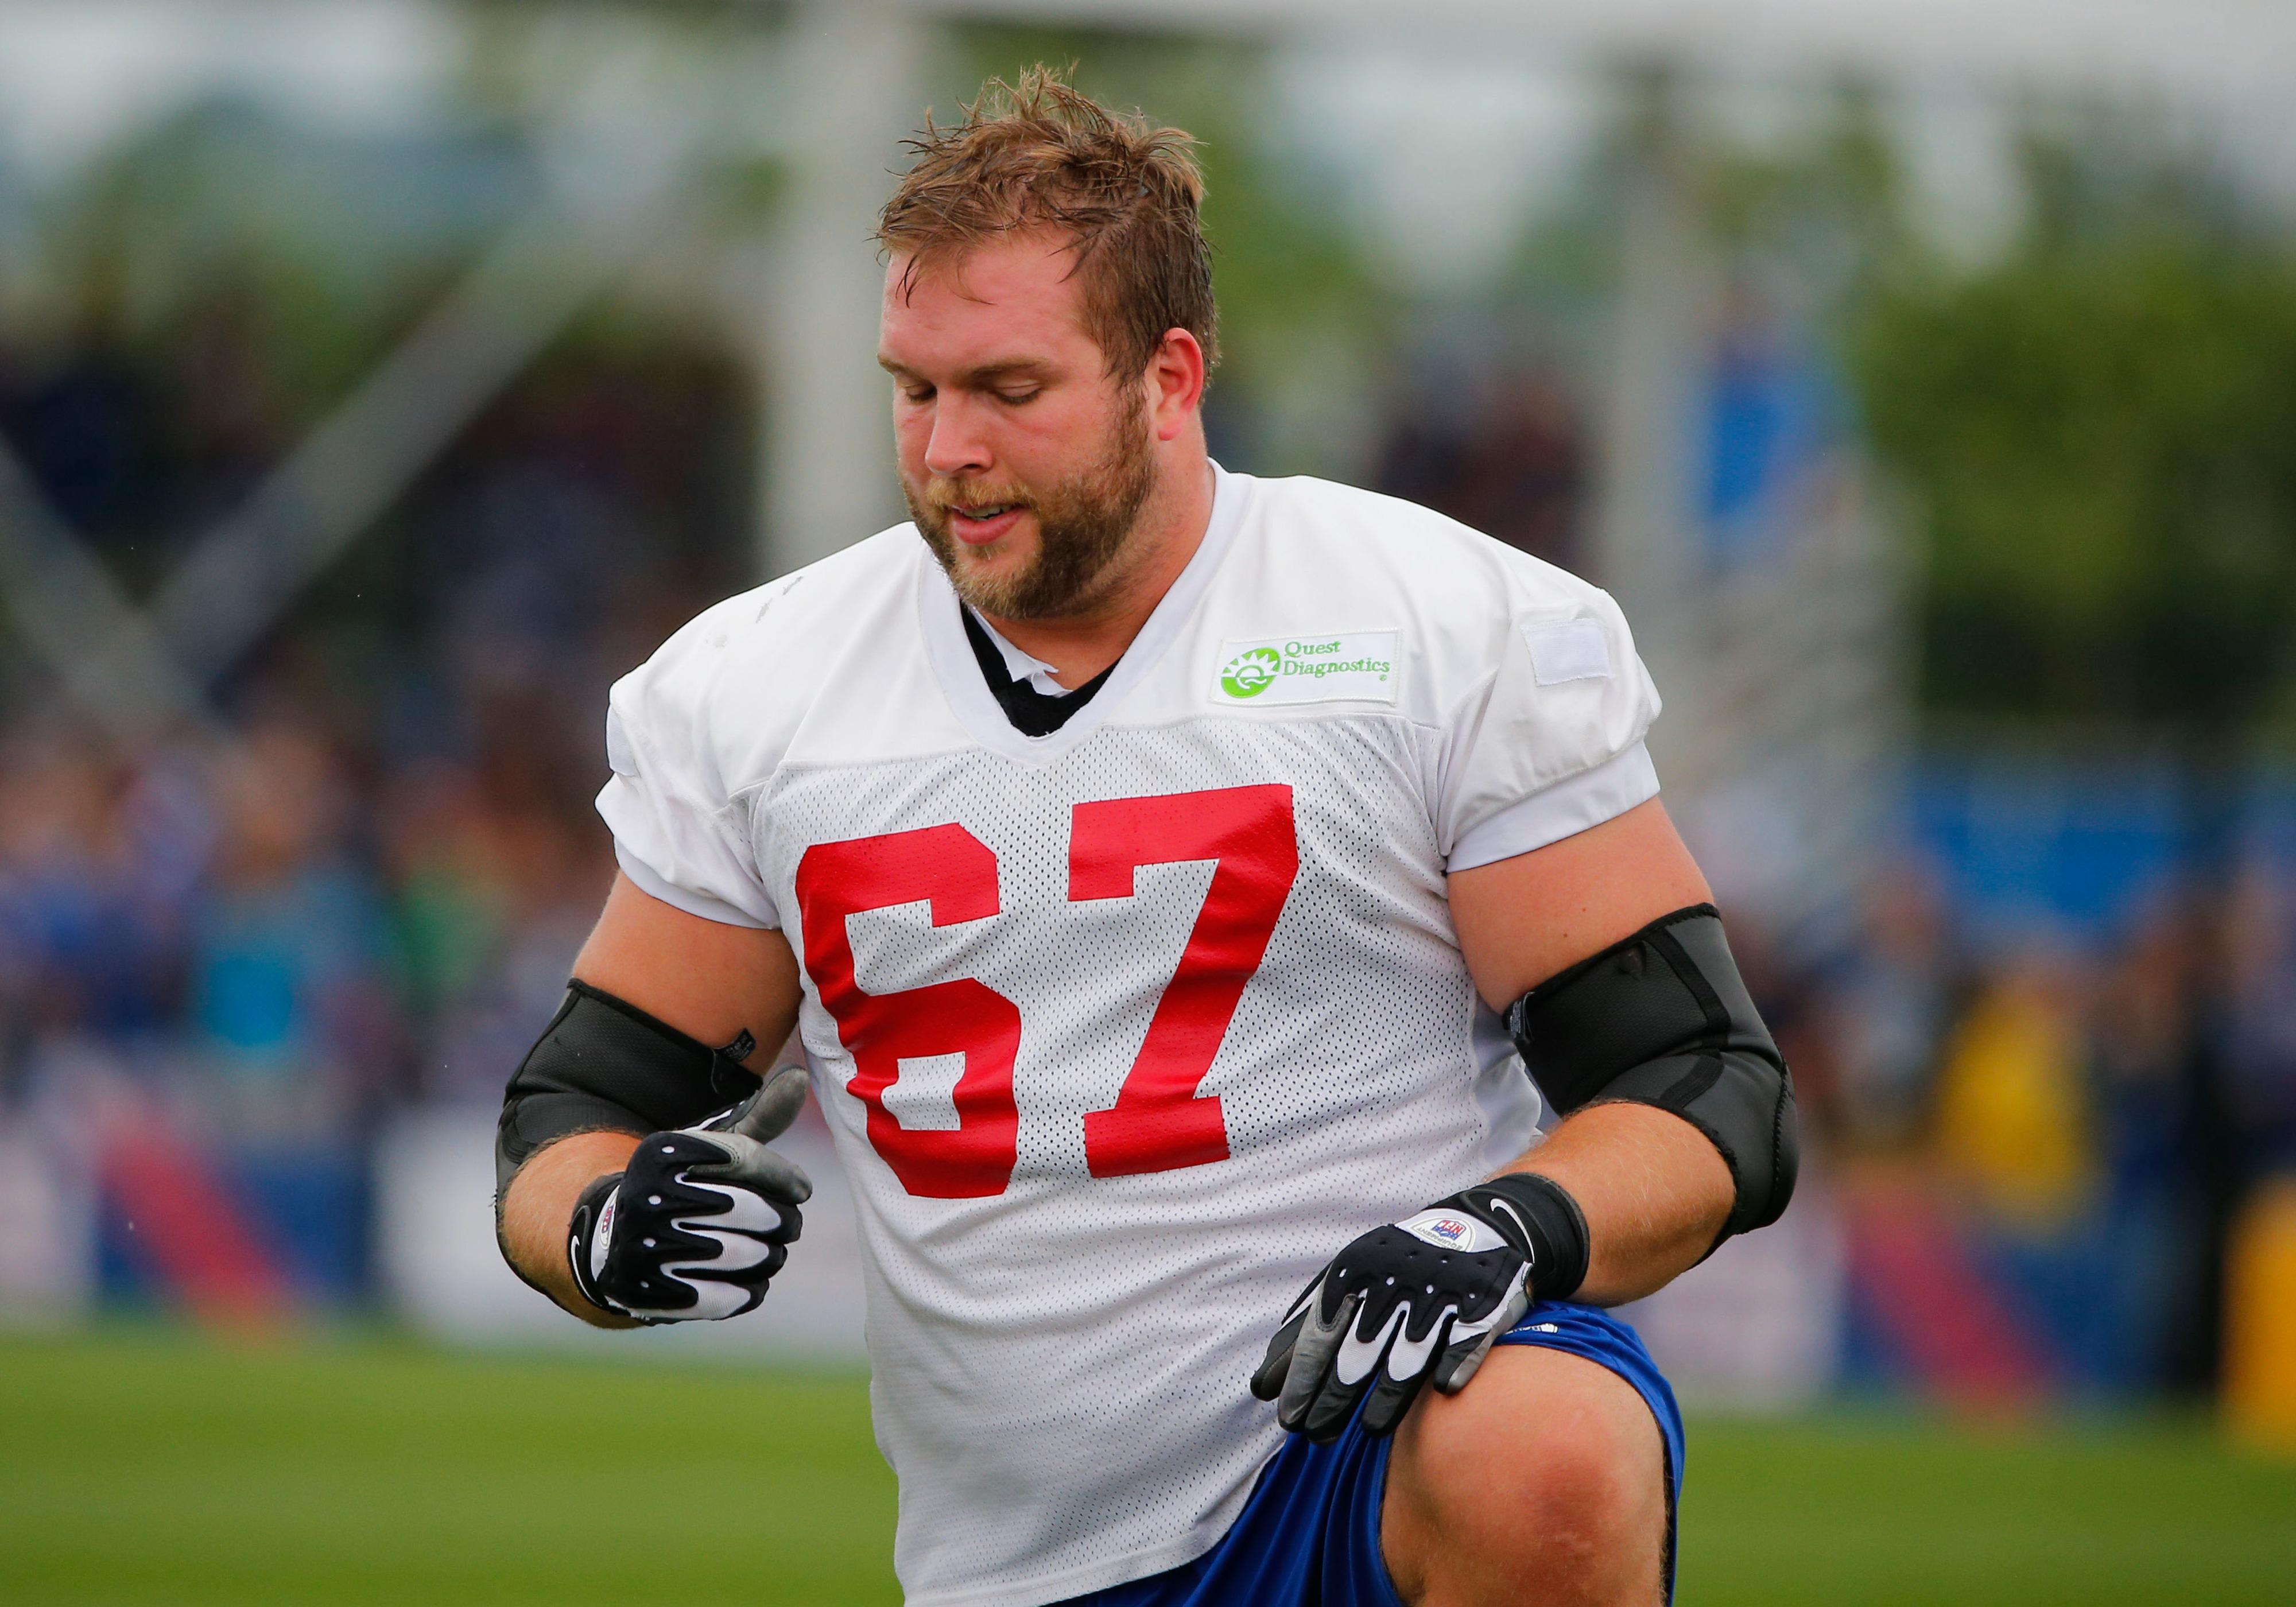 Brandon Mosley